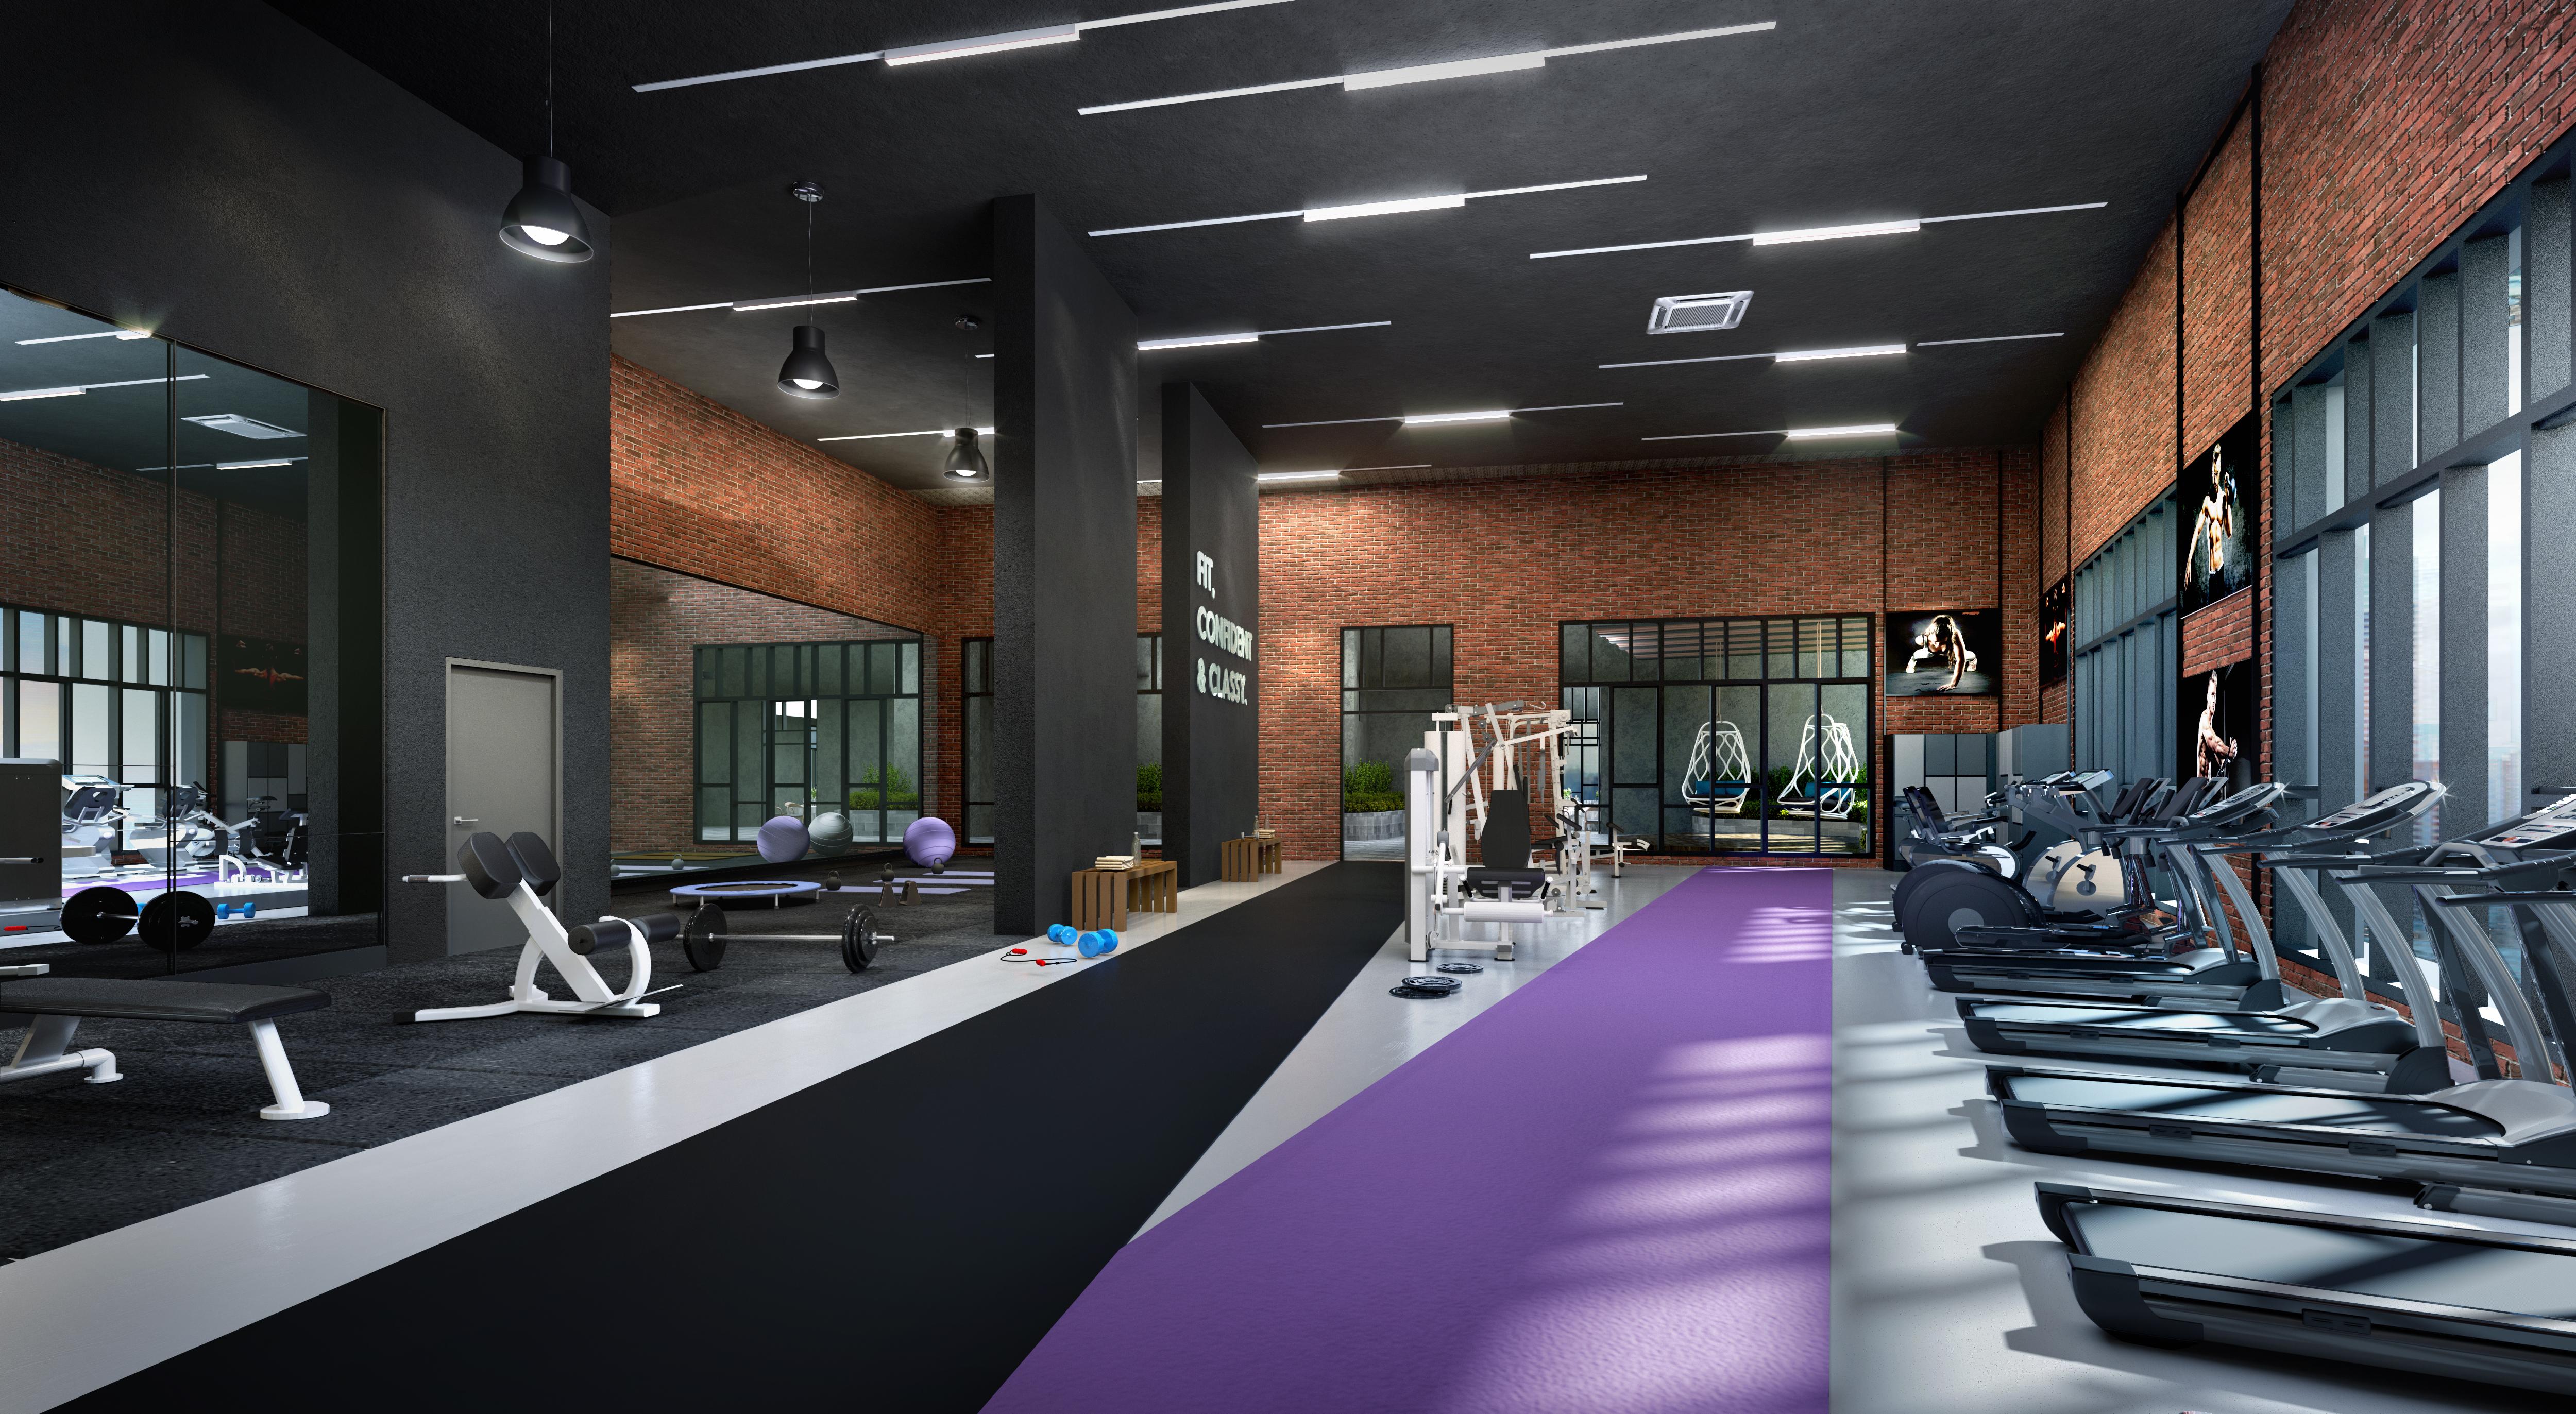 D'Vervain Fitness Chamber